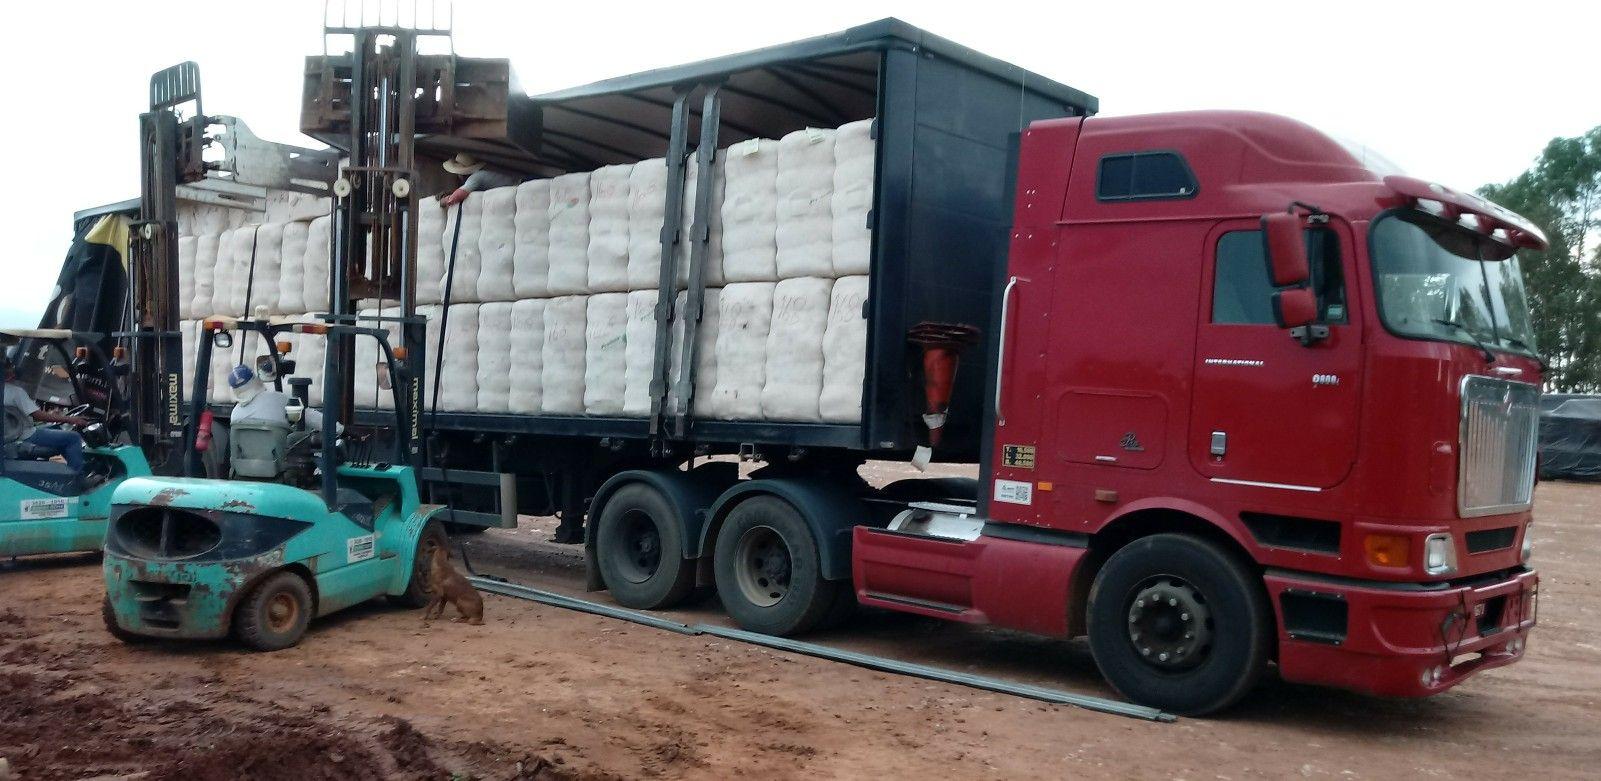 Pin by Sarel on 9800i Big rig, Trucks, Vehicles